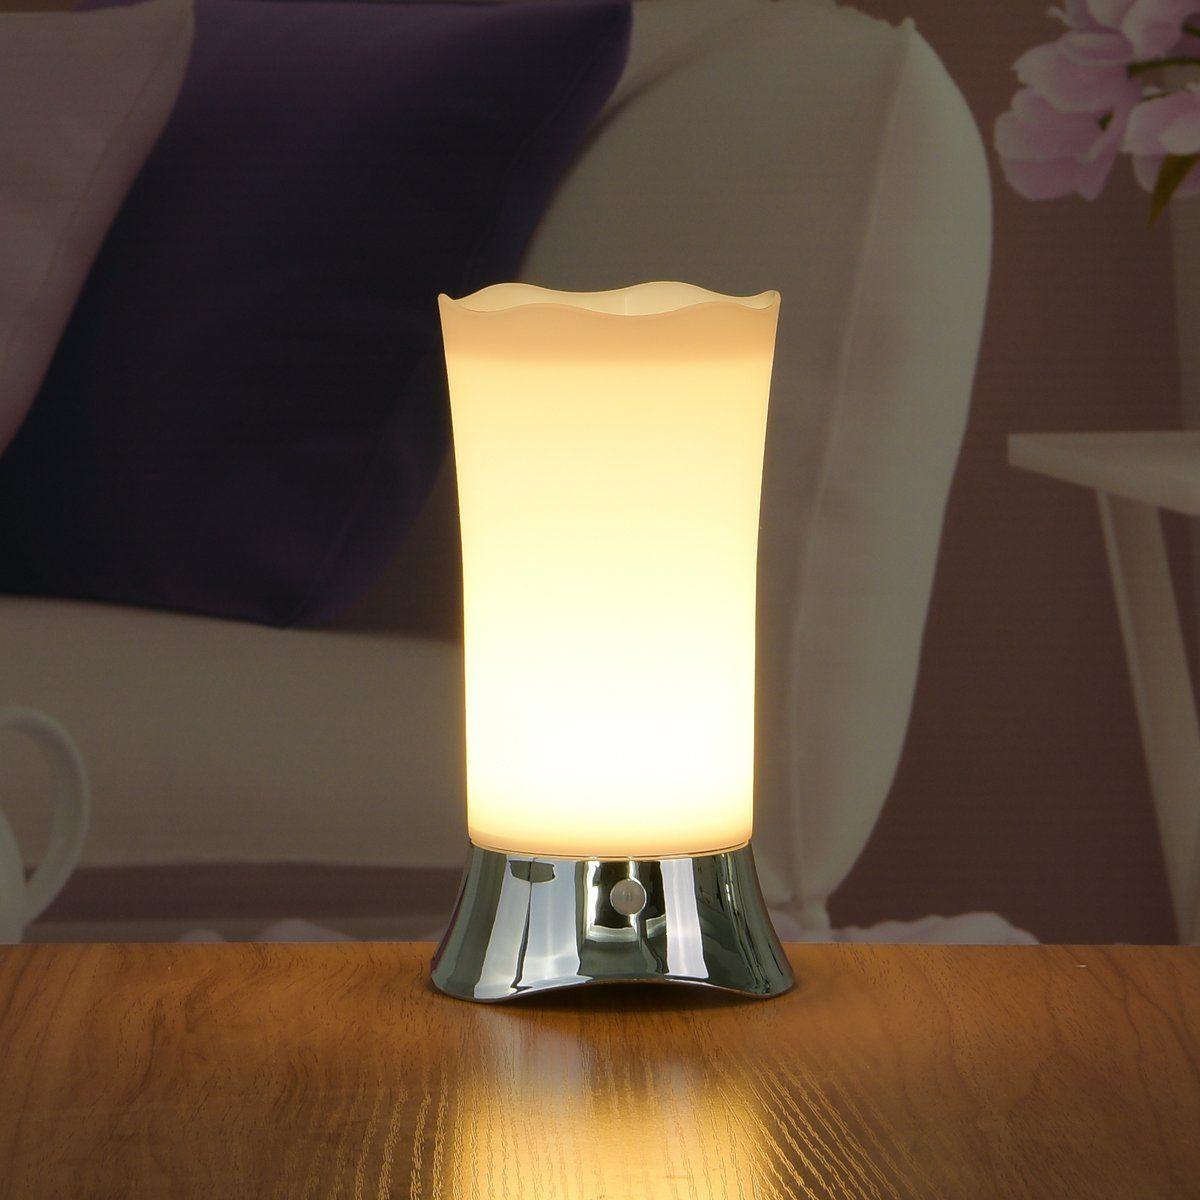 ZEEFO Table Lamps Indoor Motion Sensor LED Night Light - Portable Retro Battery Powered Light for Bedroom, Bathroom, Babyroom, Dining and Reading